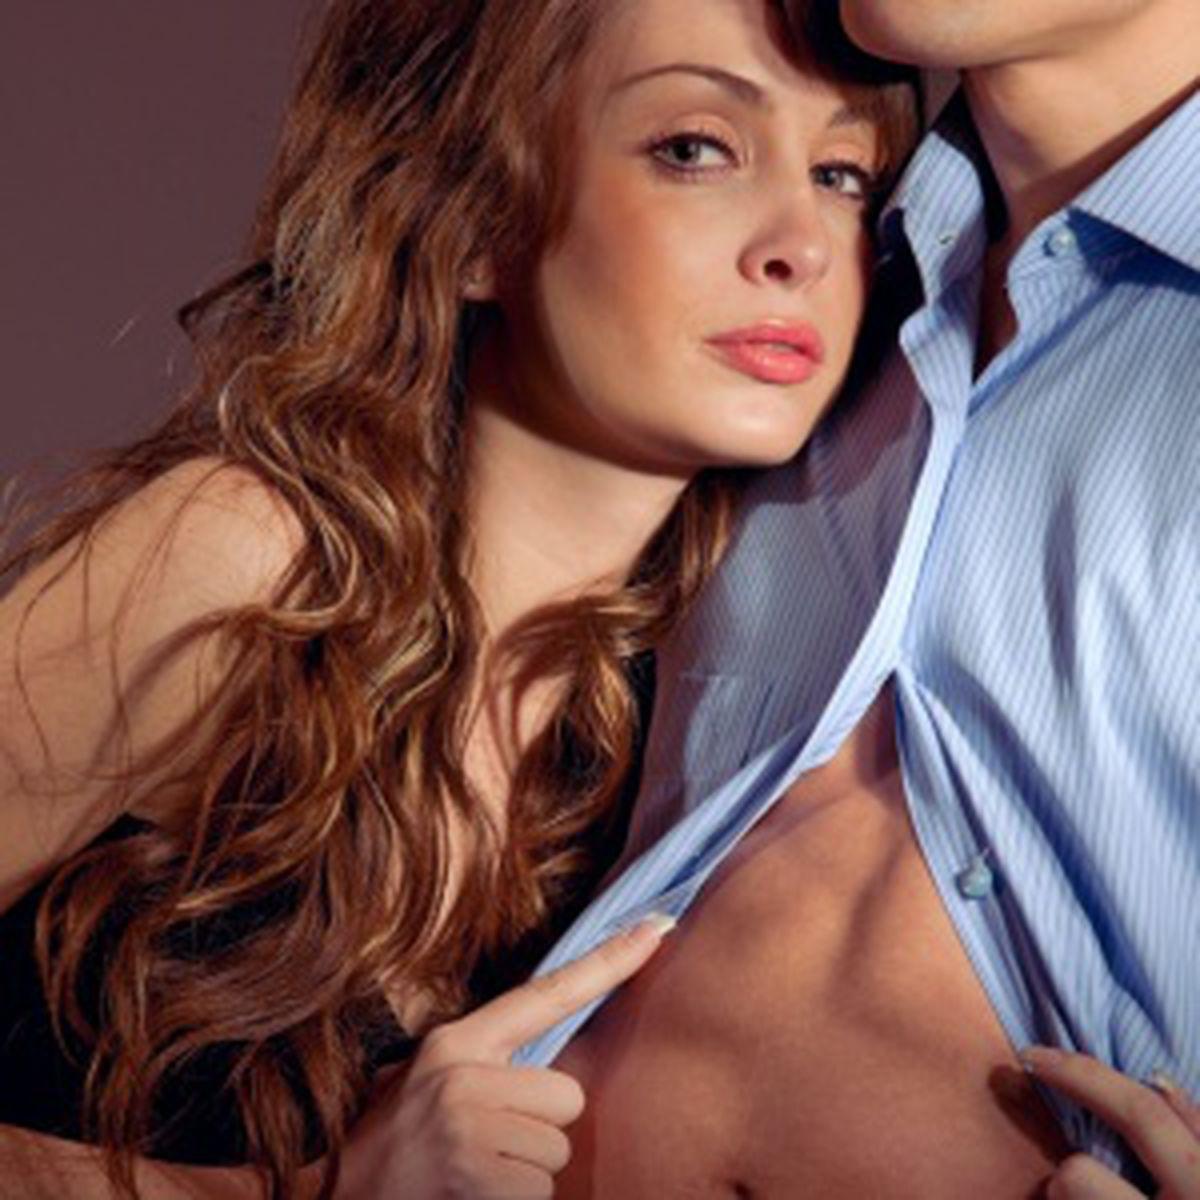 Pentru femei: Invata sa-i manevrezi penisul! Ai aici 10 reguli